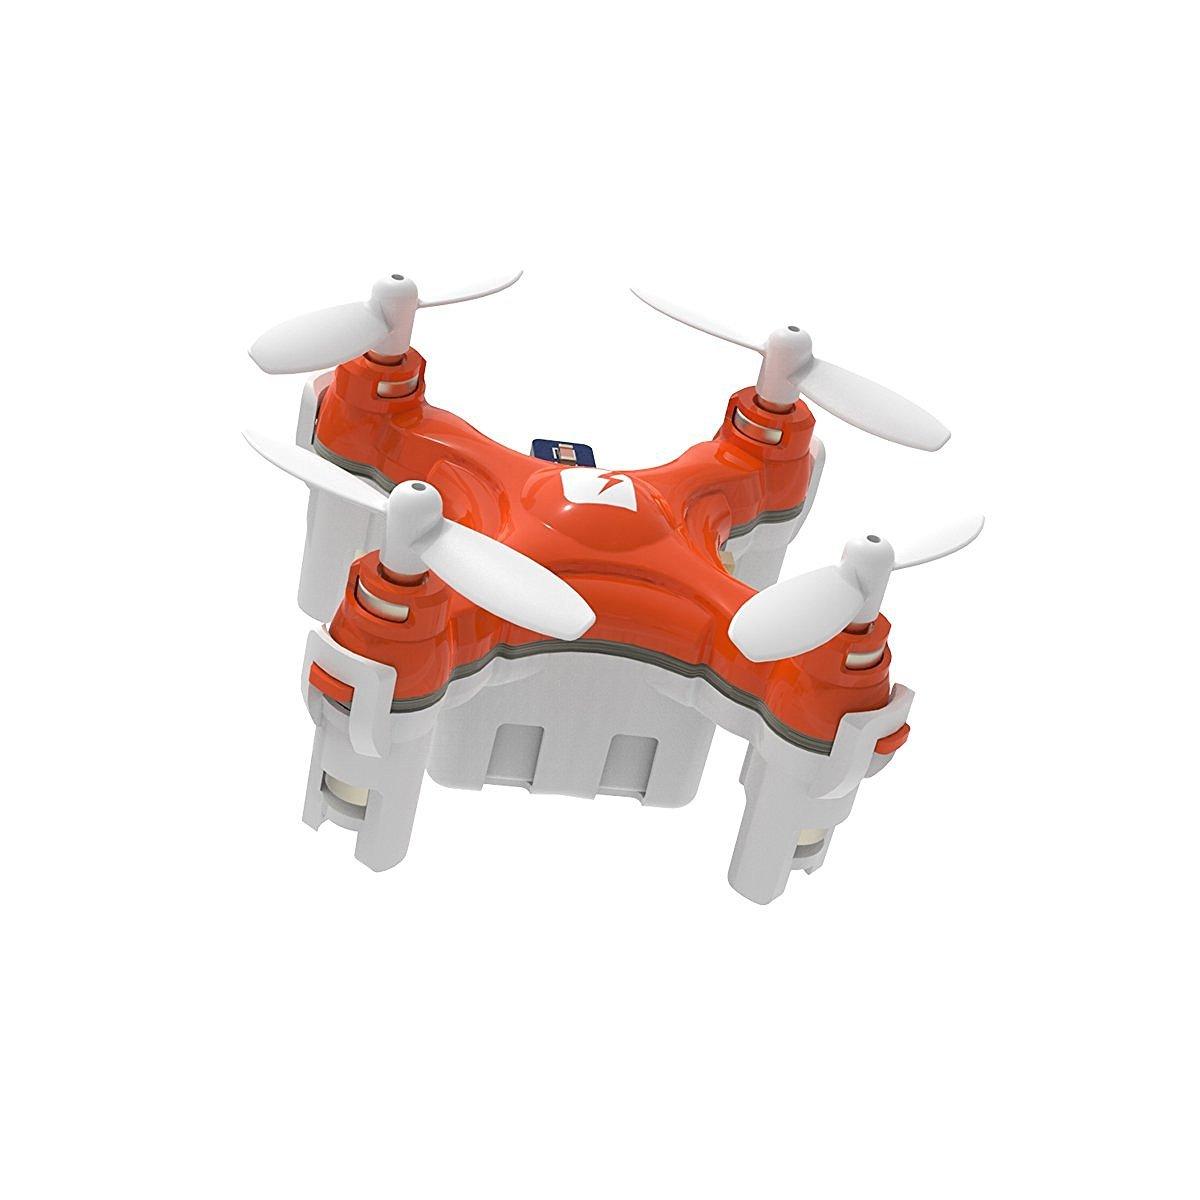 SKEYE Pico Drone - Remote Controlled - Micro Quadcopter with RTF ...